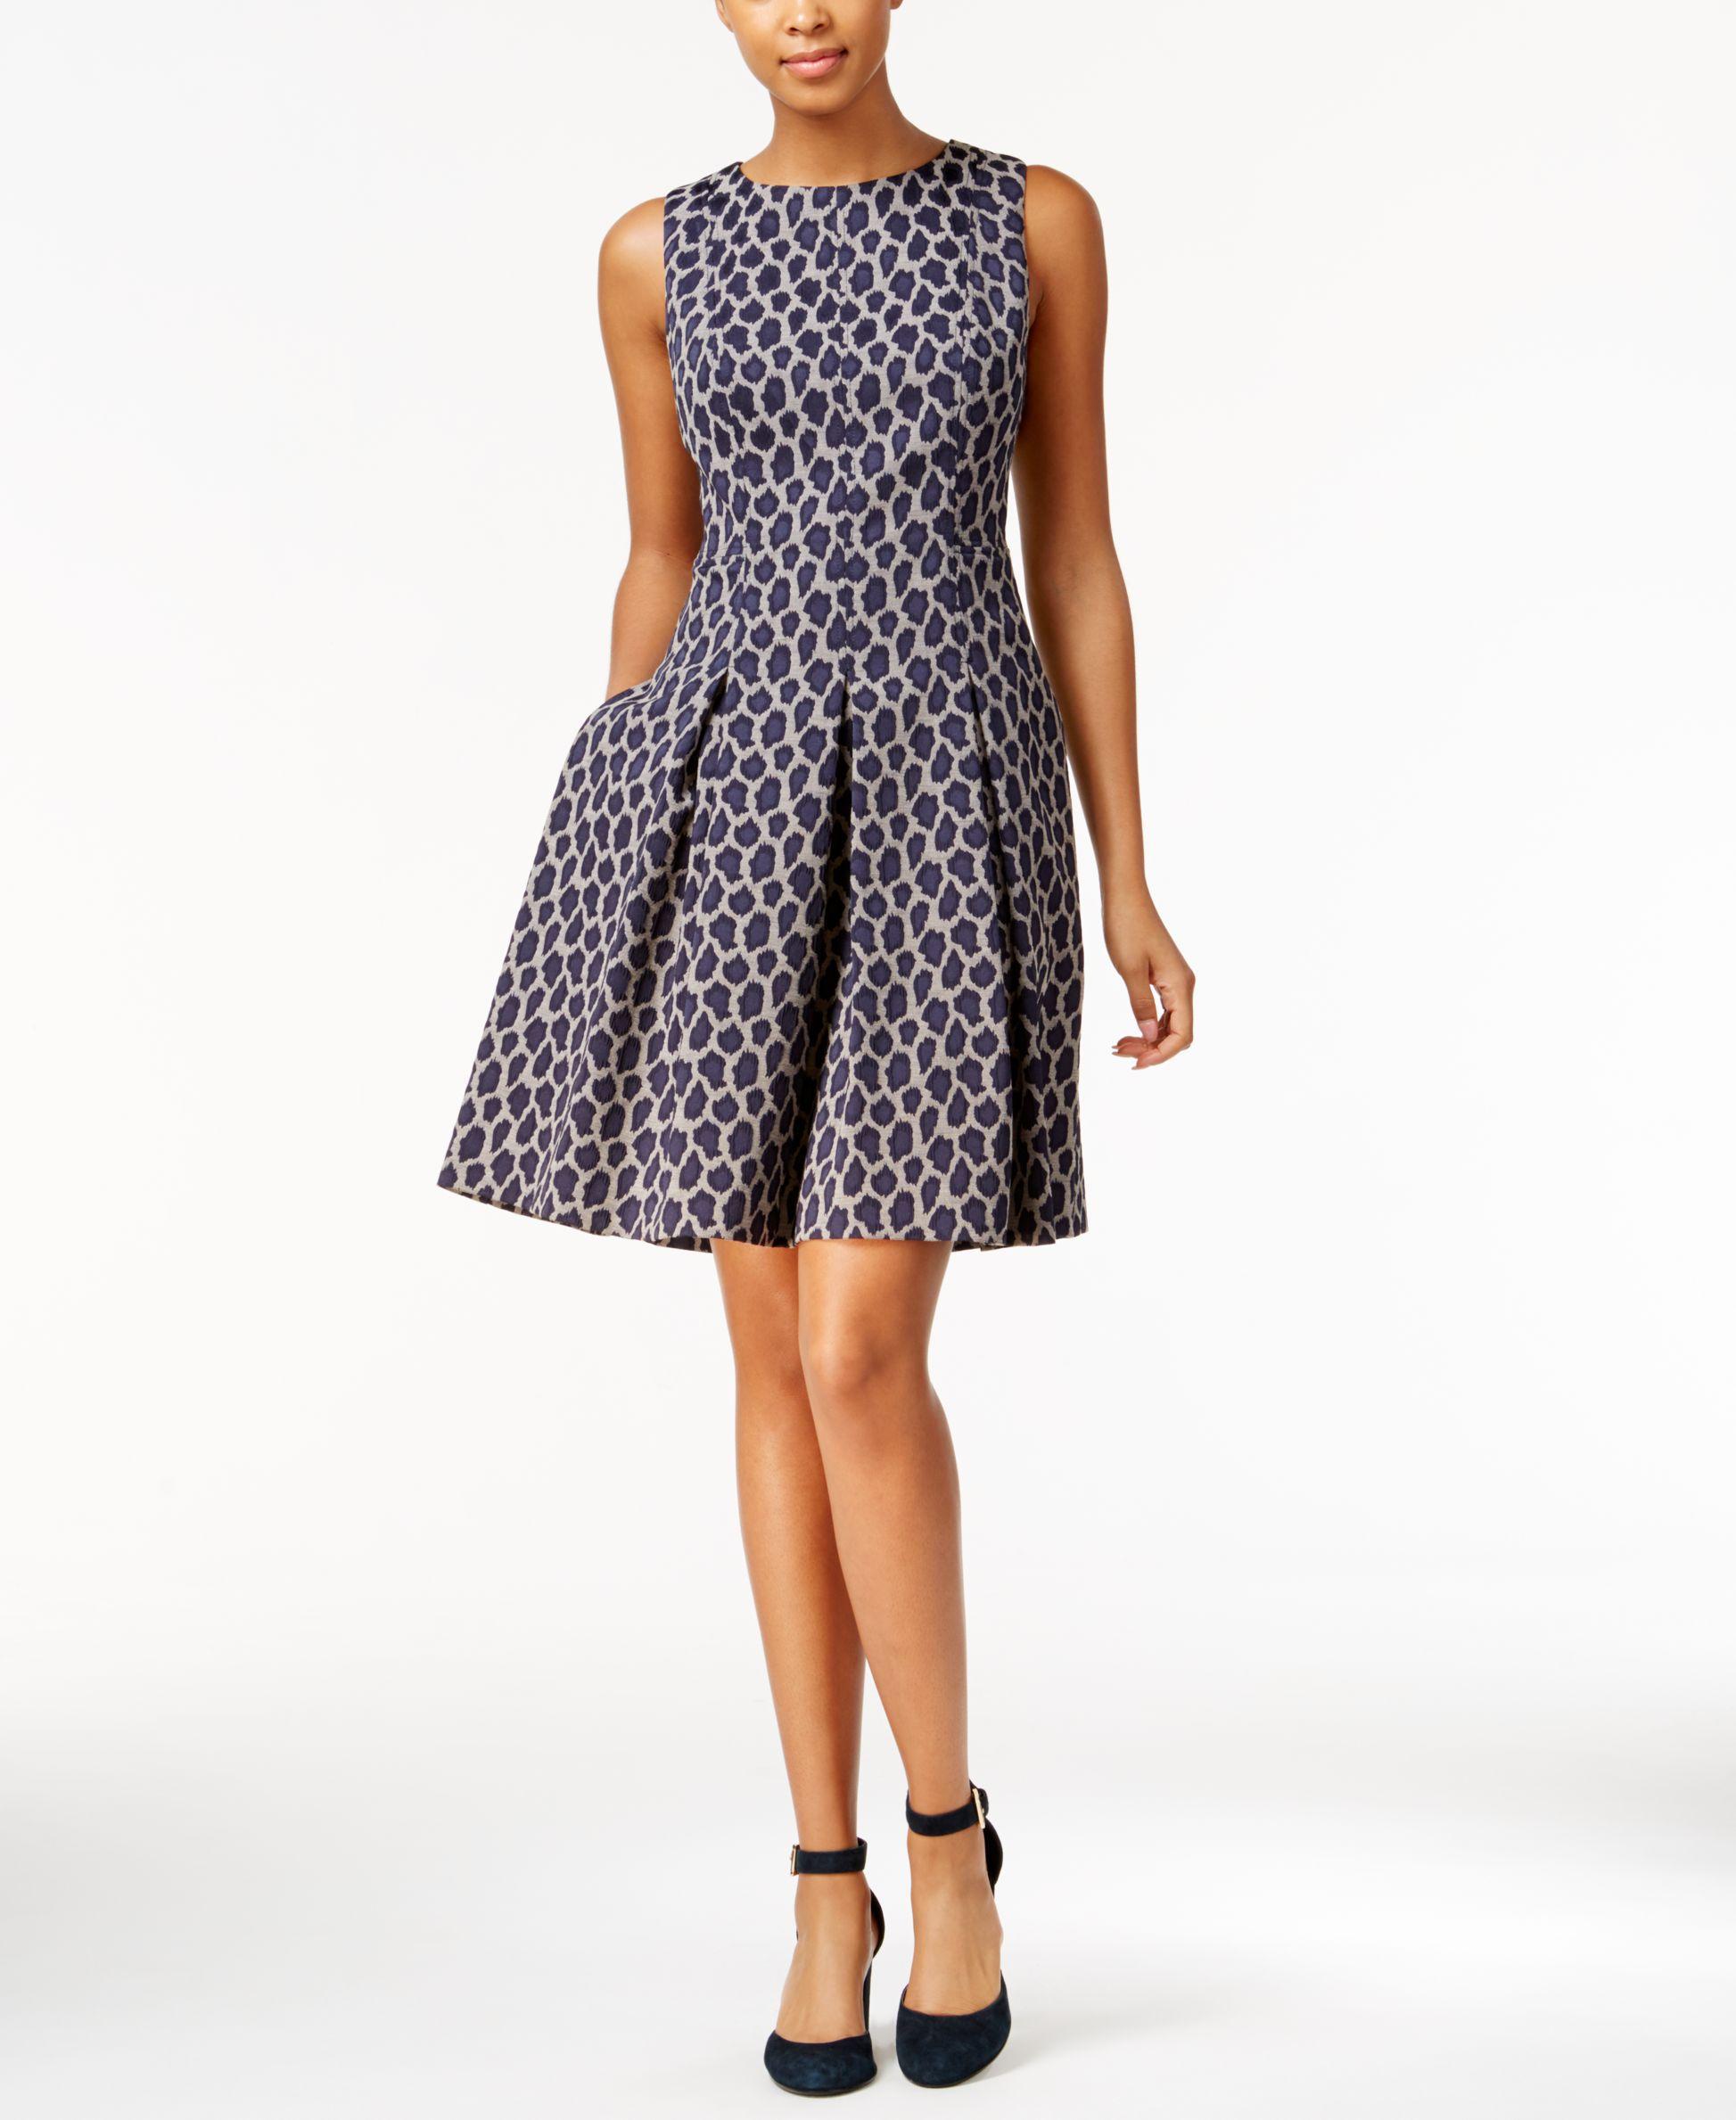 98c885bb4fc Lyst - Tommy Hilfiger Leopard-print Fit   Flare Dress in Blue